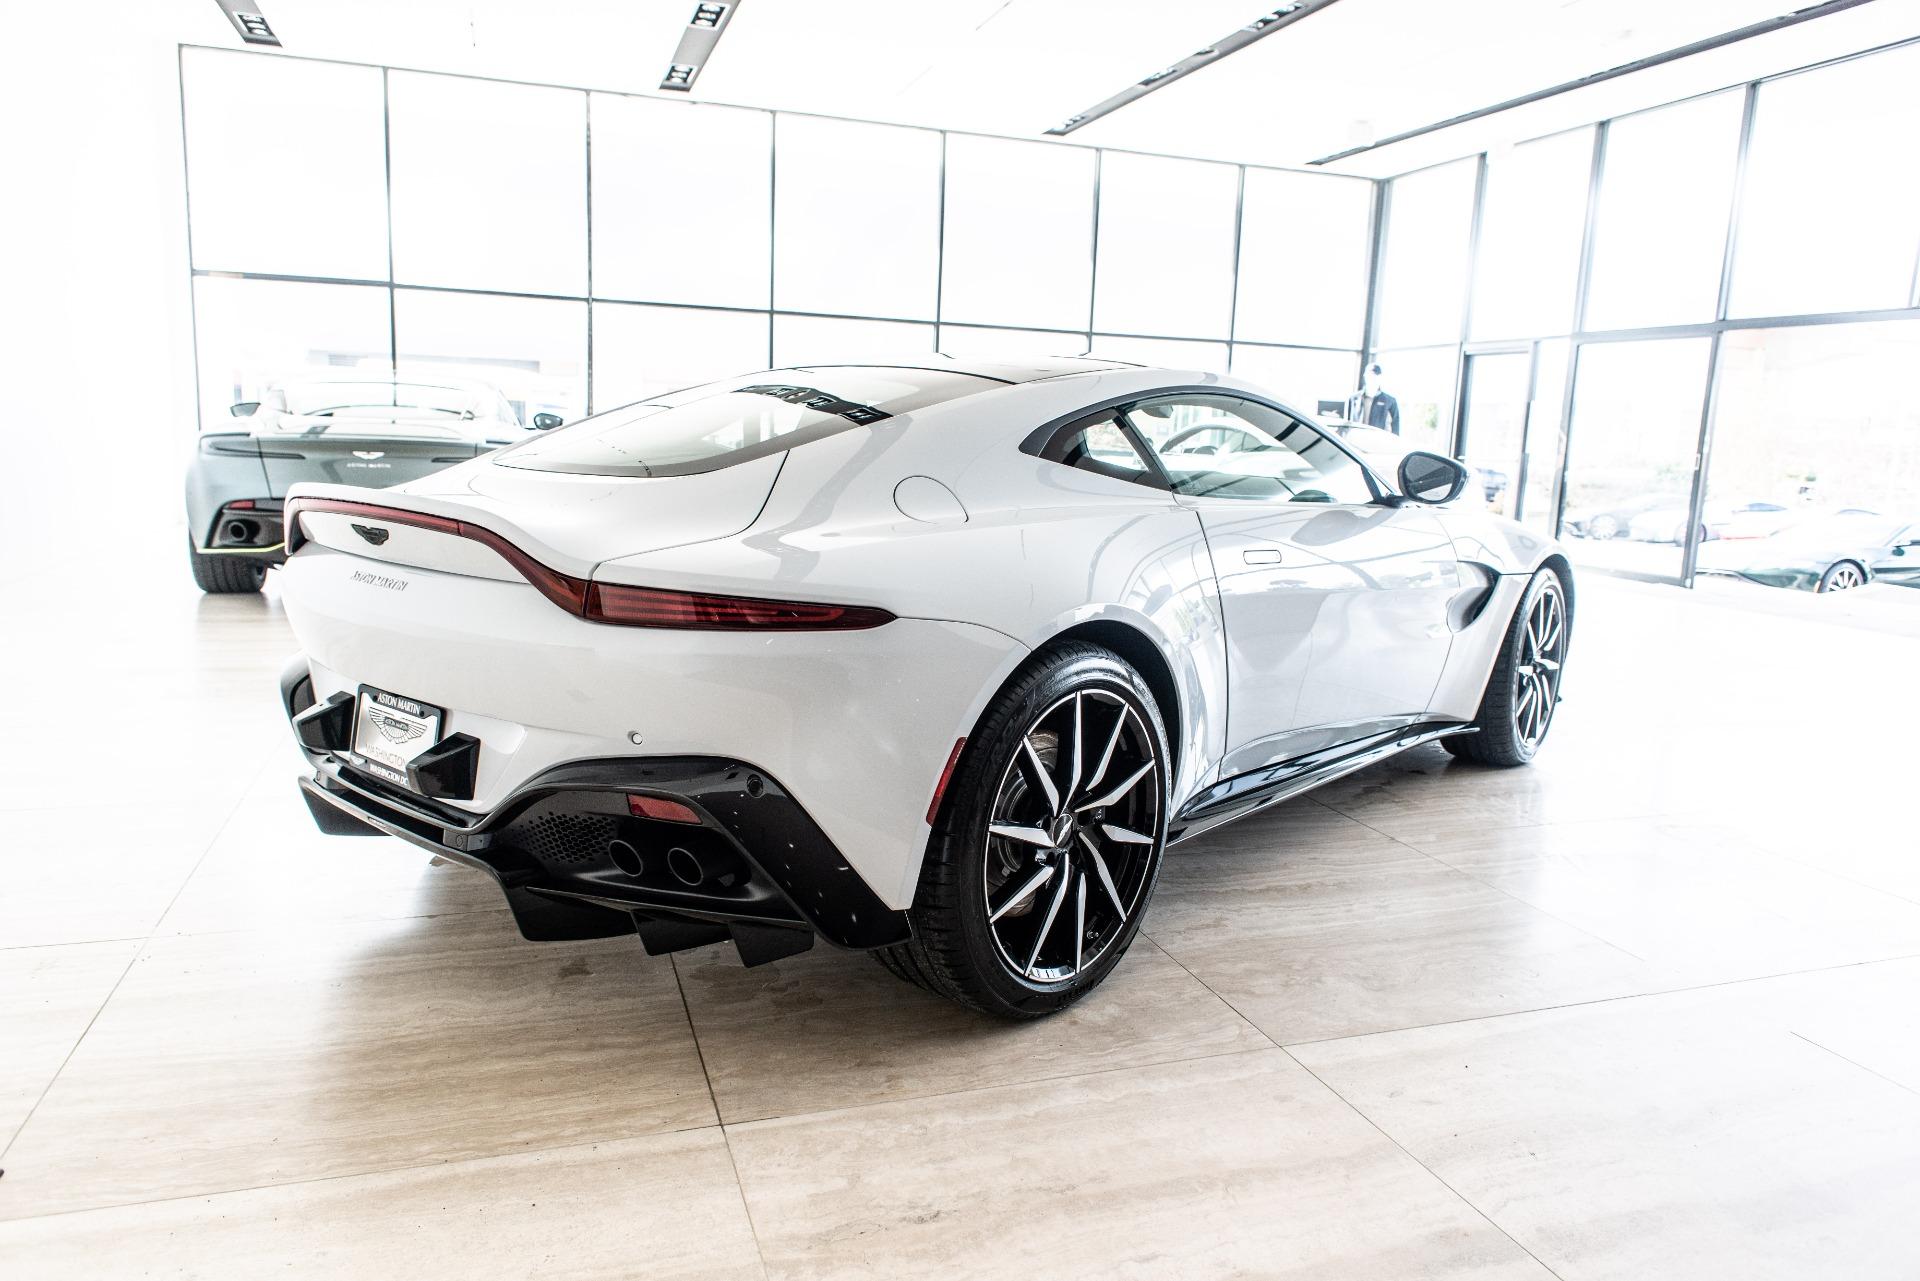 2019 Aston Martin Vantage Stock 9nn01611 For Sale Near